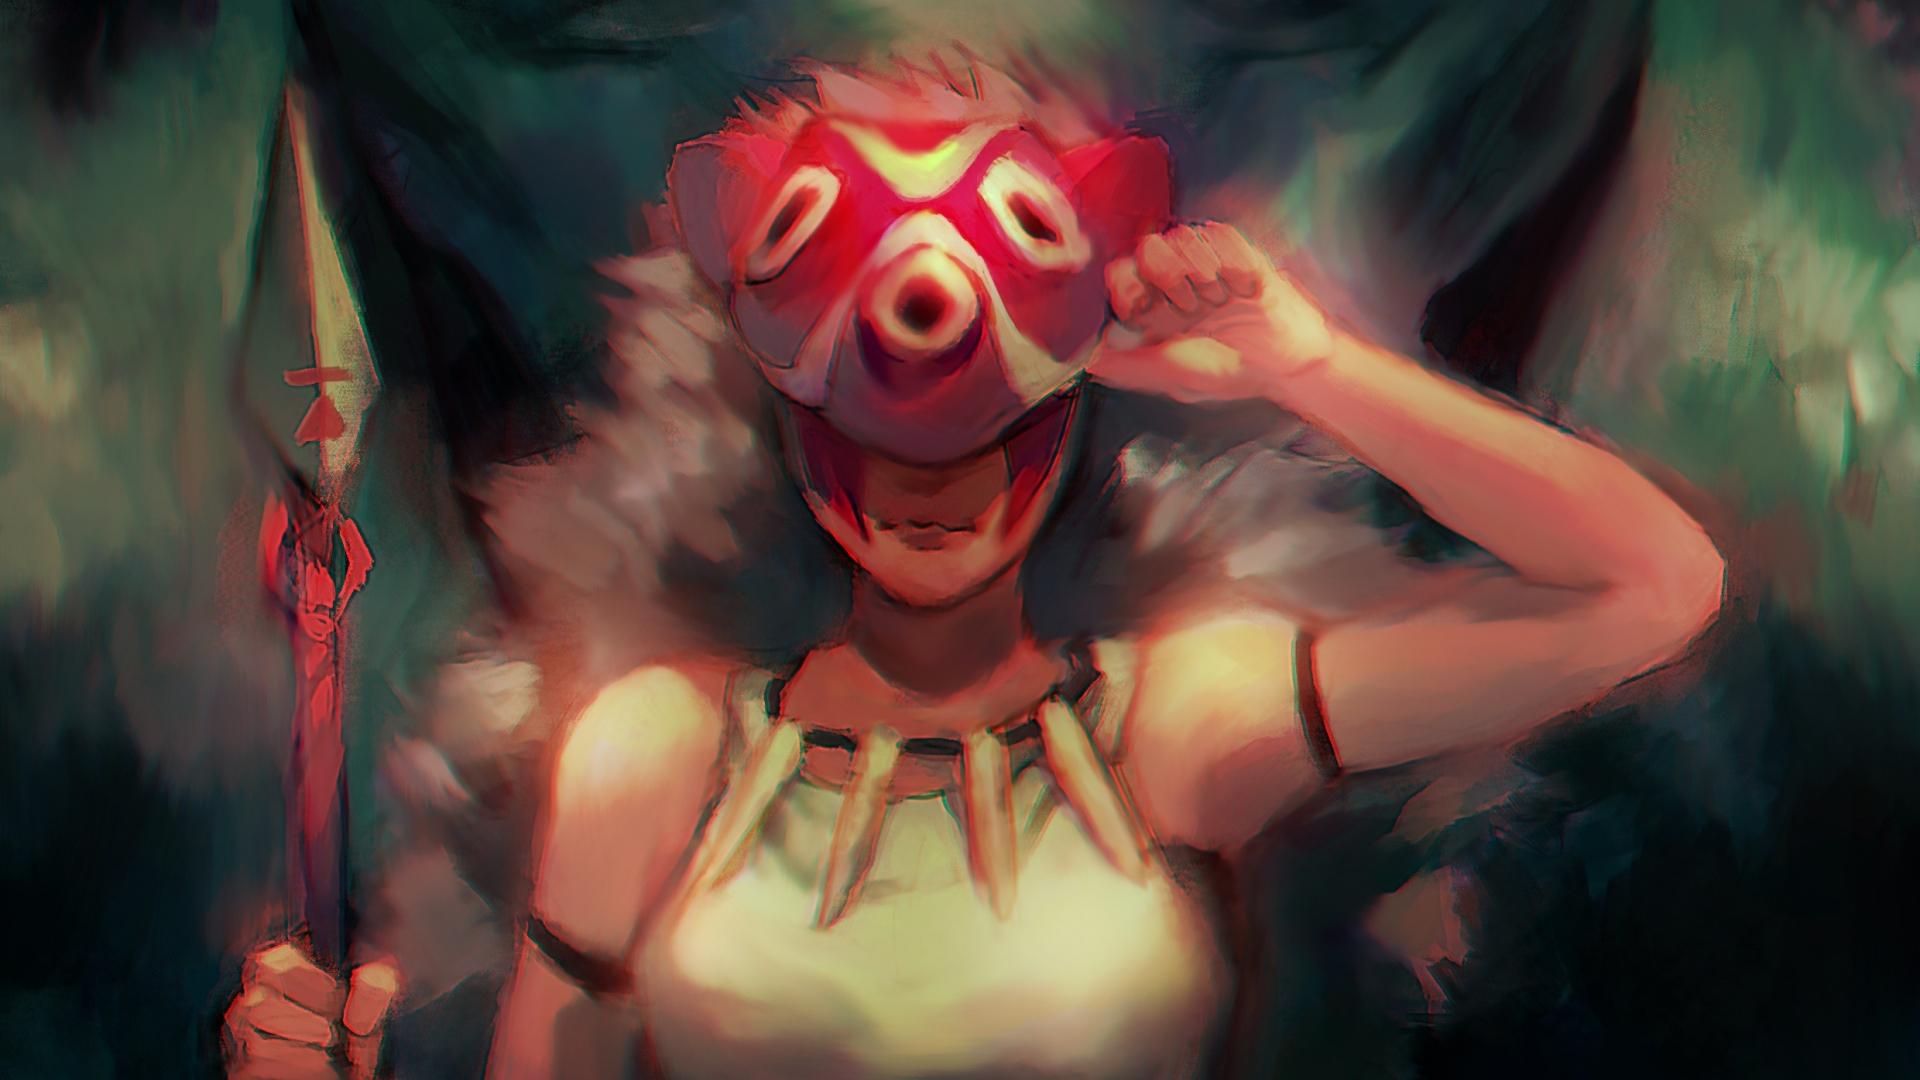 Download 1920x1080 Wallpaper Princess Mononoke Dark Anime Art Full Hd Hdtv Fhd 1080p 1920x1080 Hd Image Background 16986